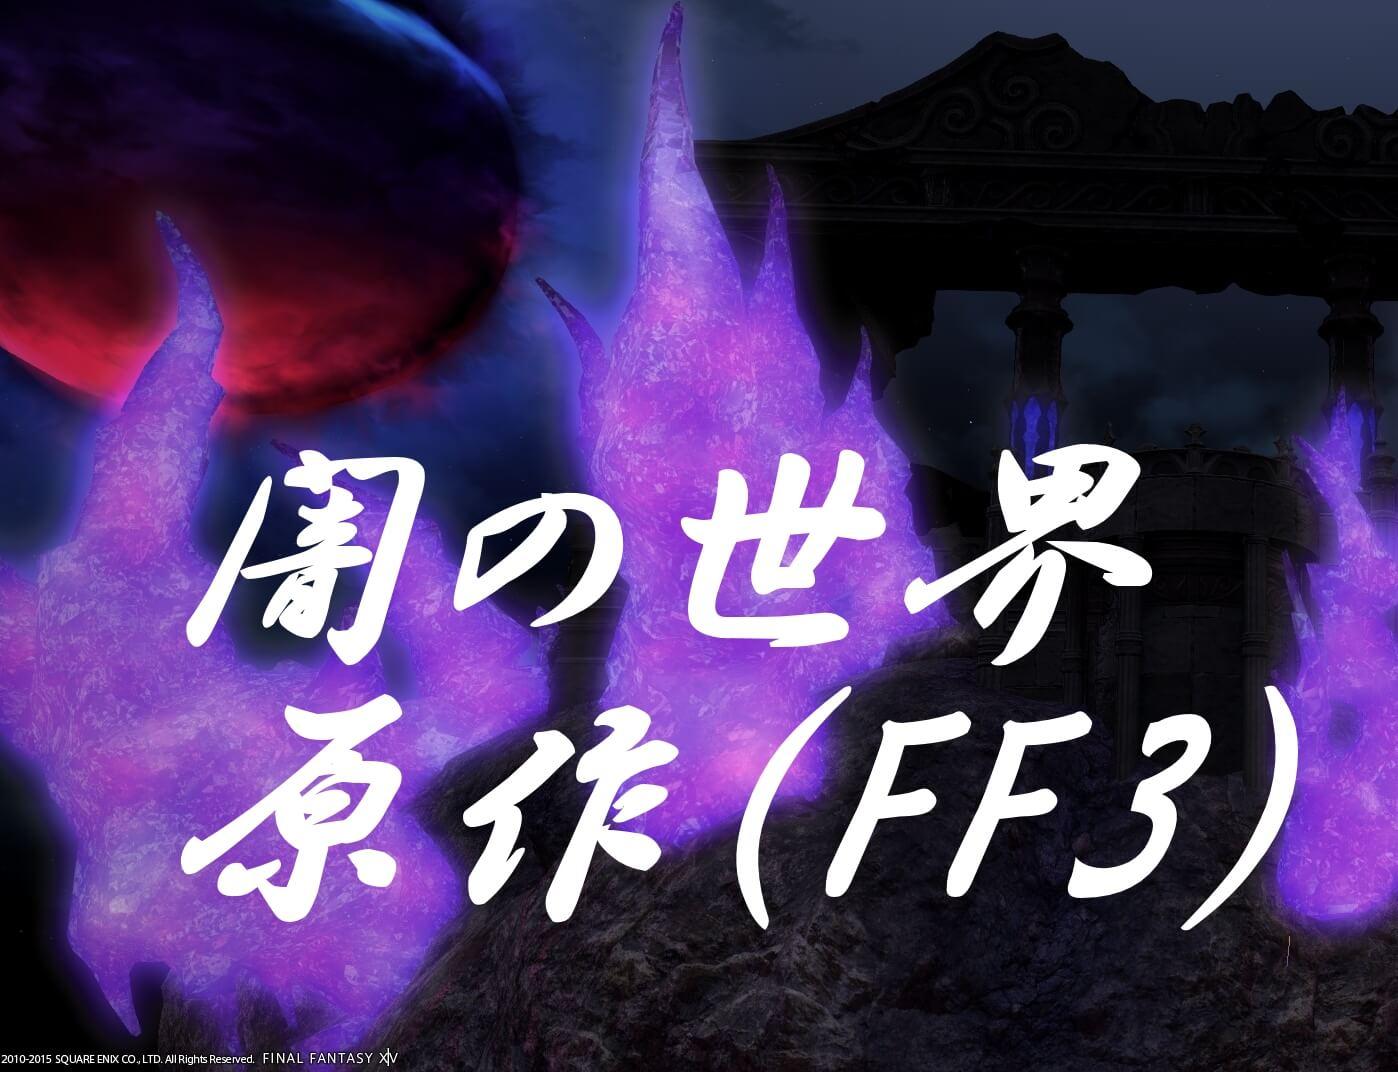 【FF14】闇の世界原作(FF3)